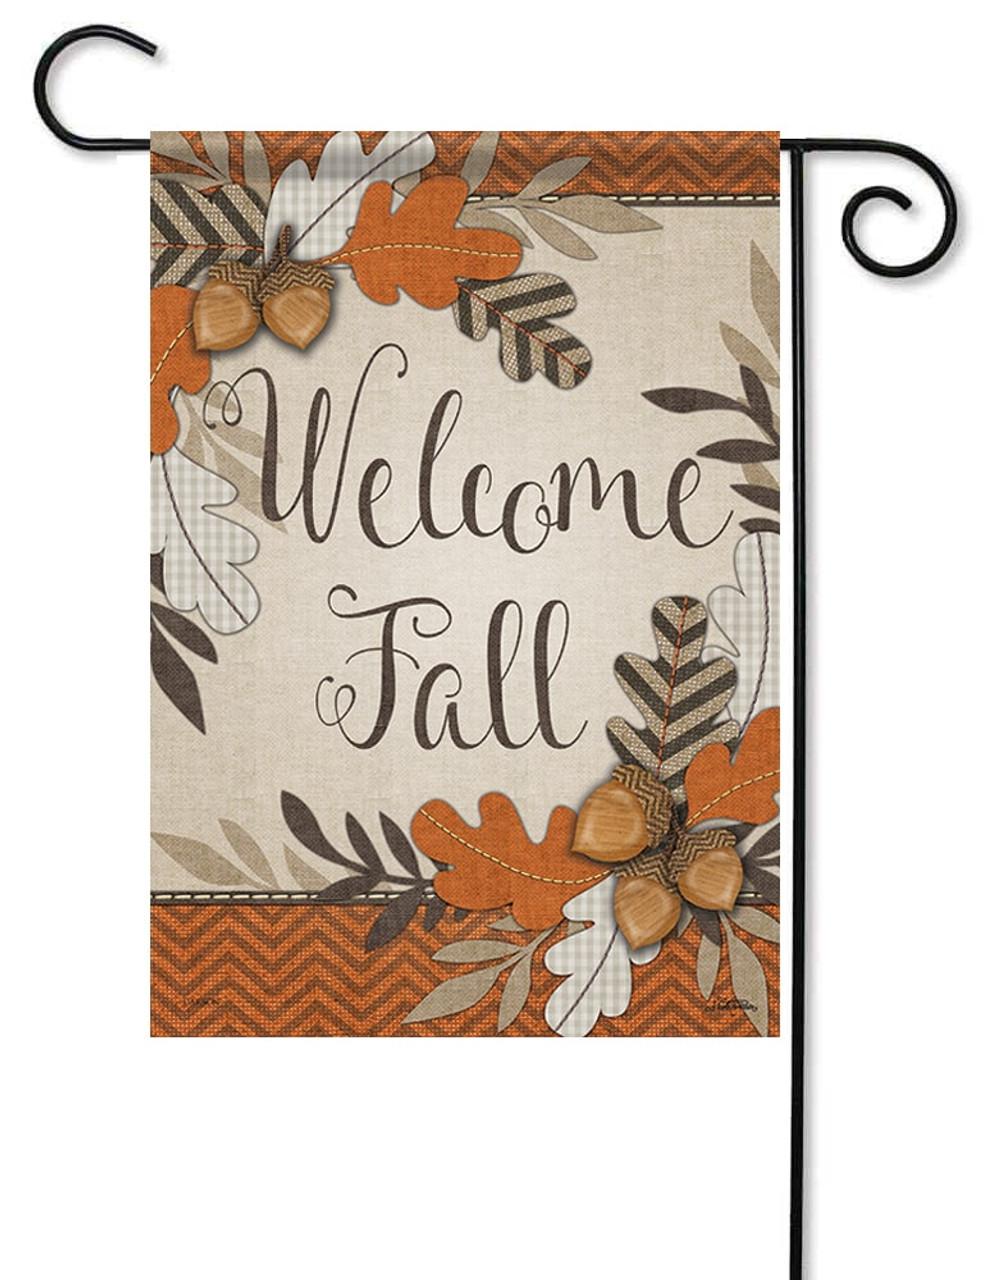 Elegant Crafty Fall Welcome Decorative Garden Flag